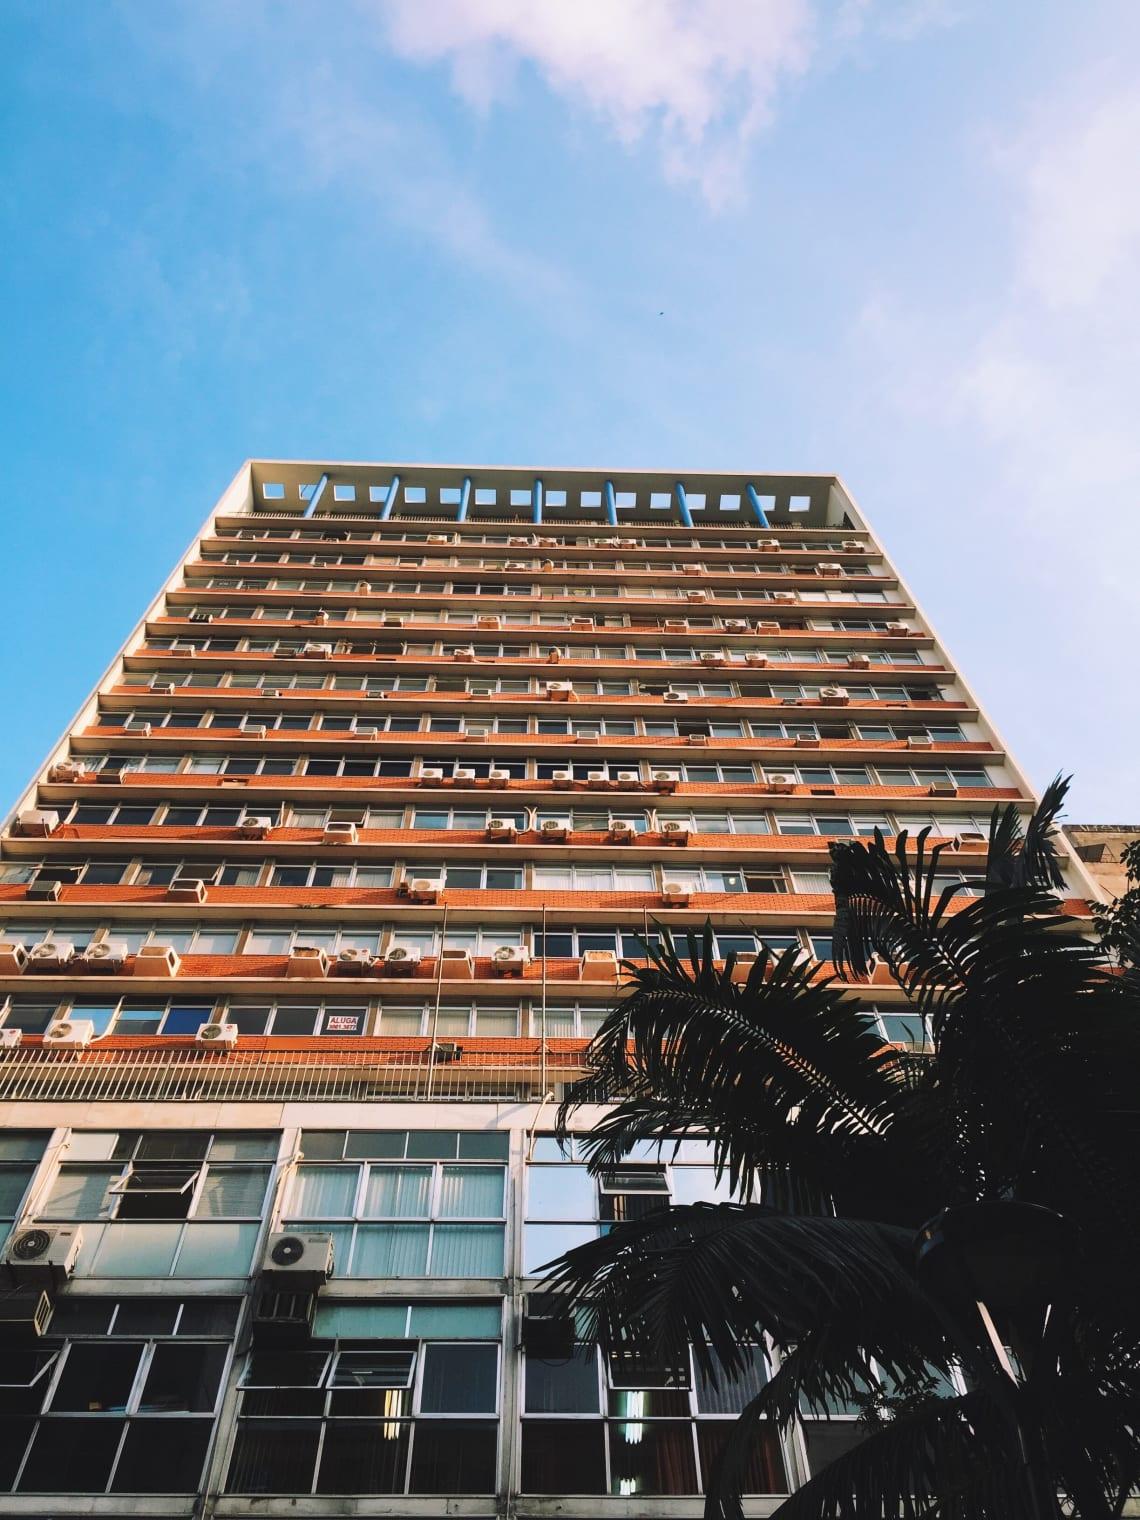 Porto Alegre, Brazil, South America